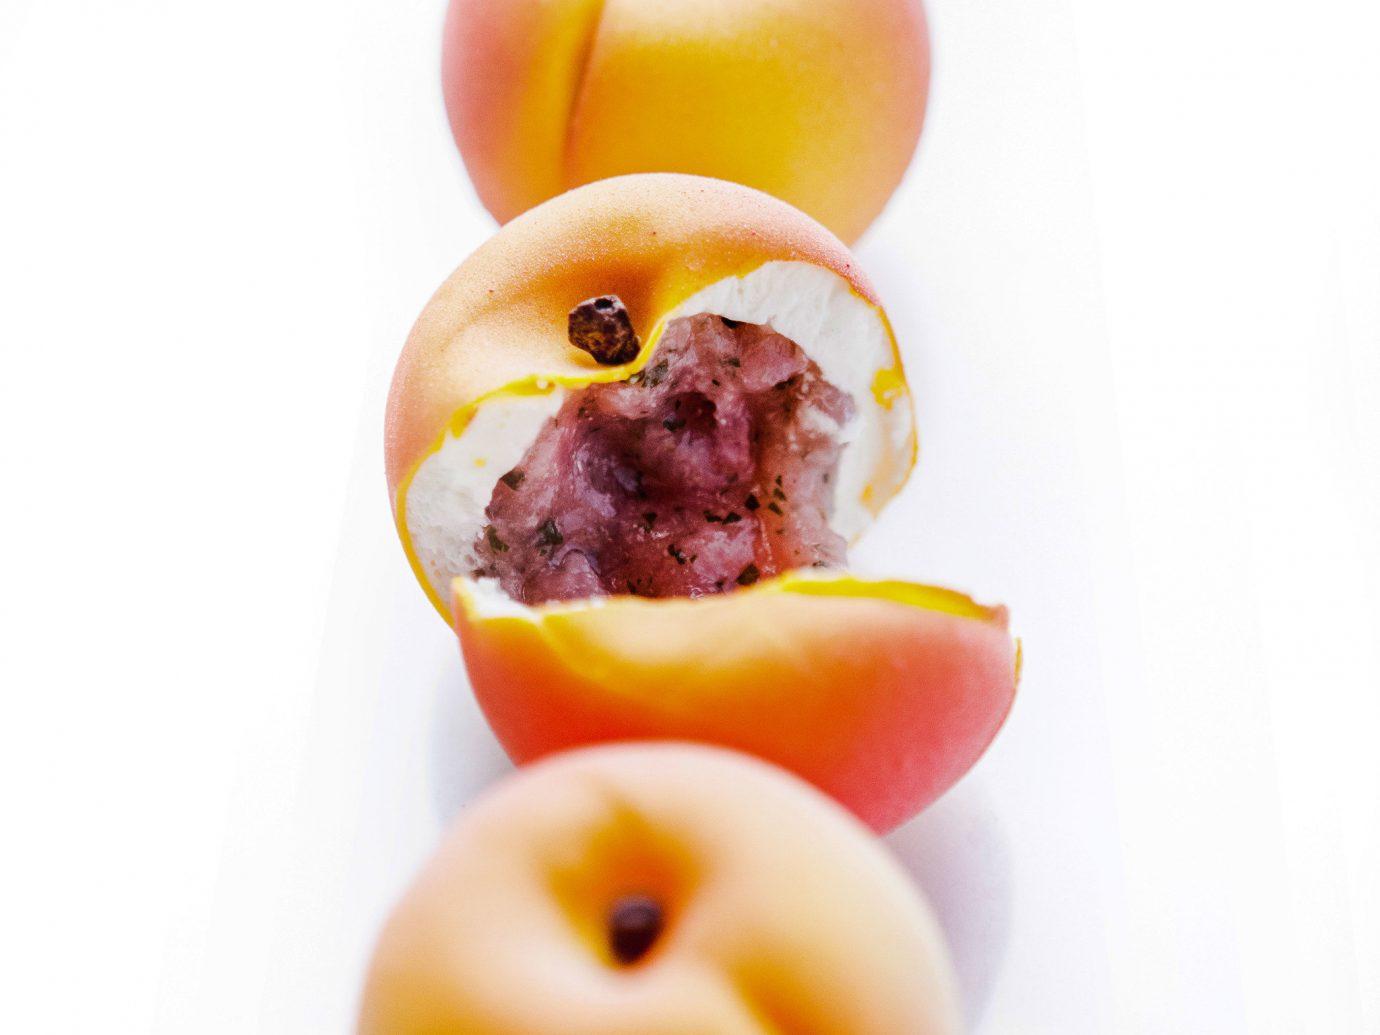 europe Trip Ideas fruit food produce peach sliced donut apricot